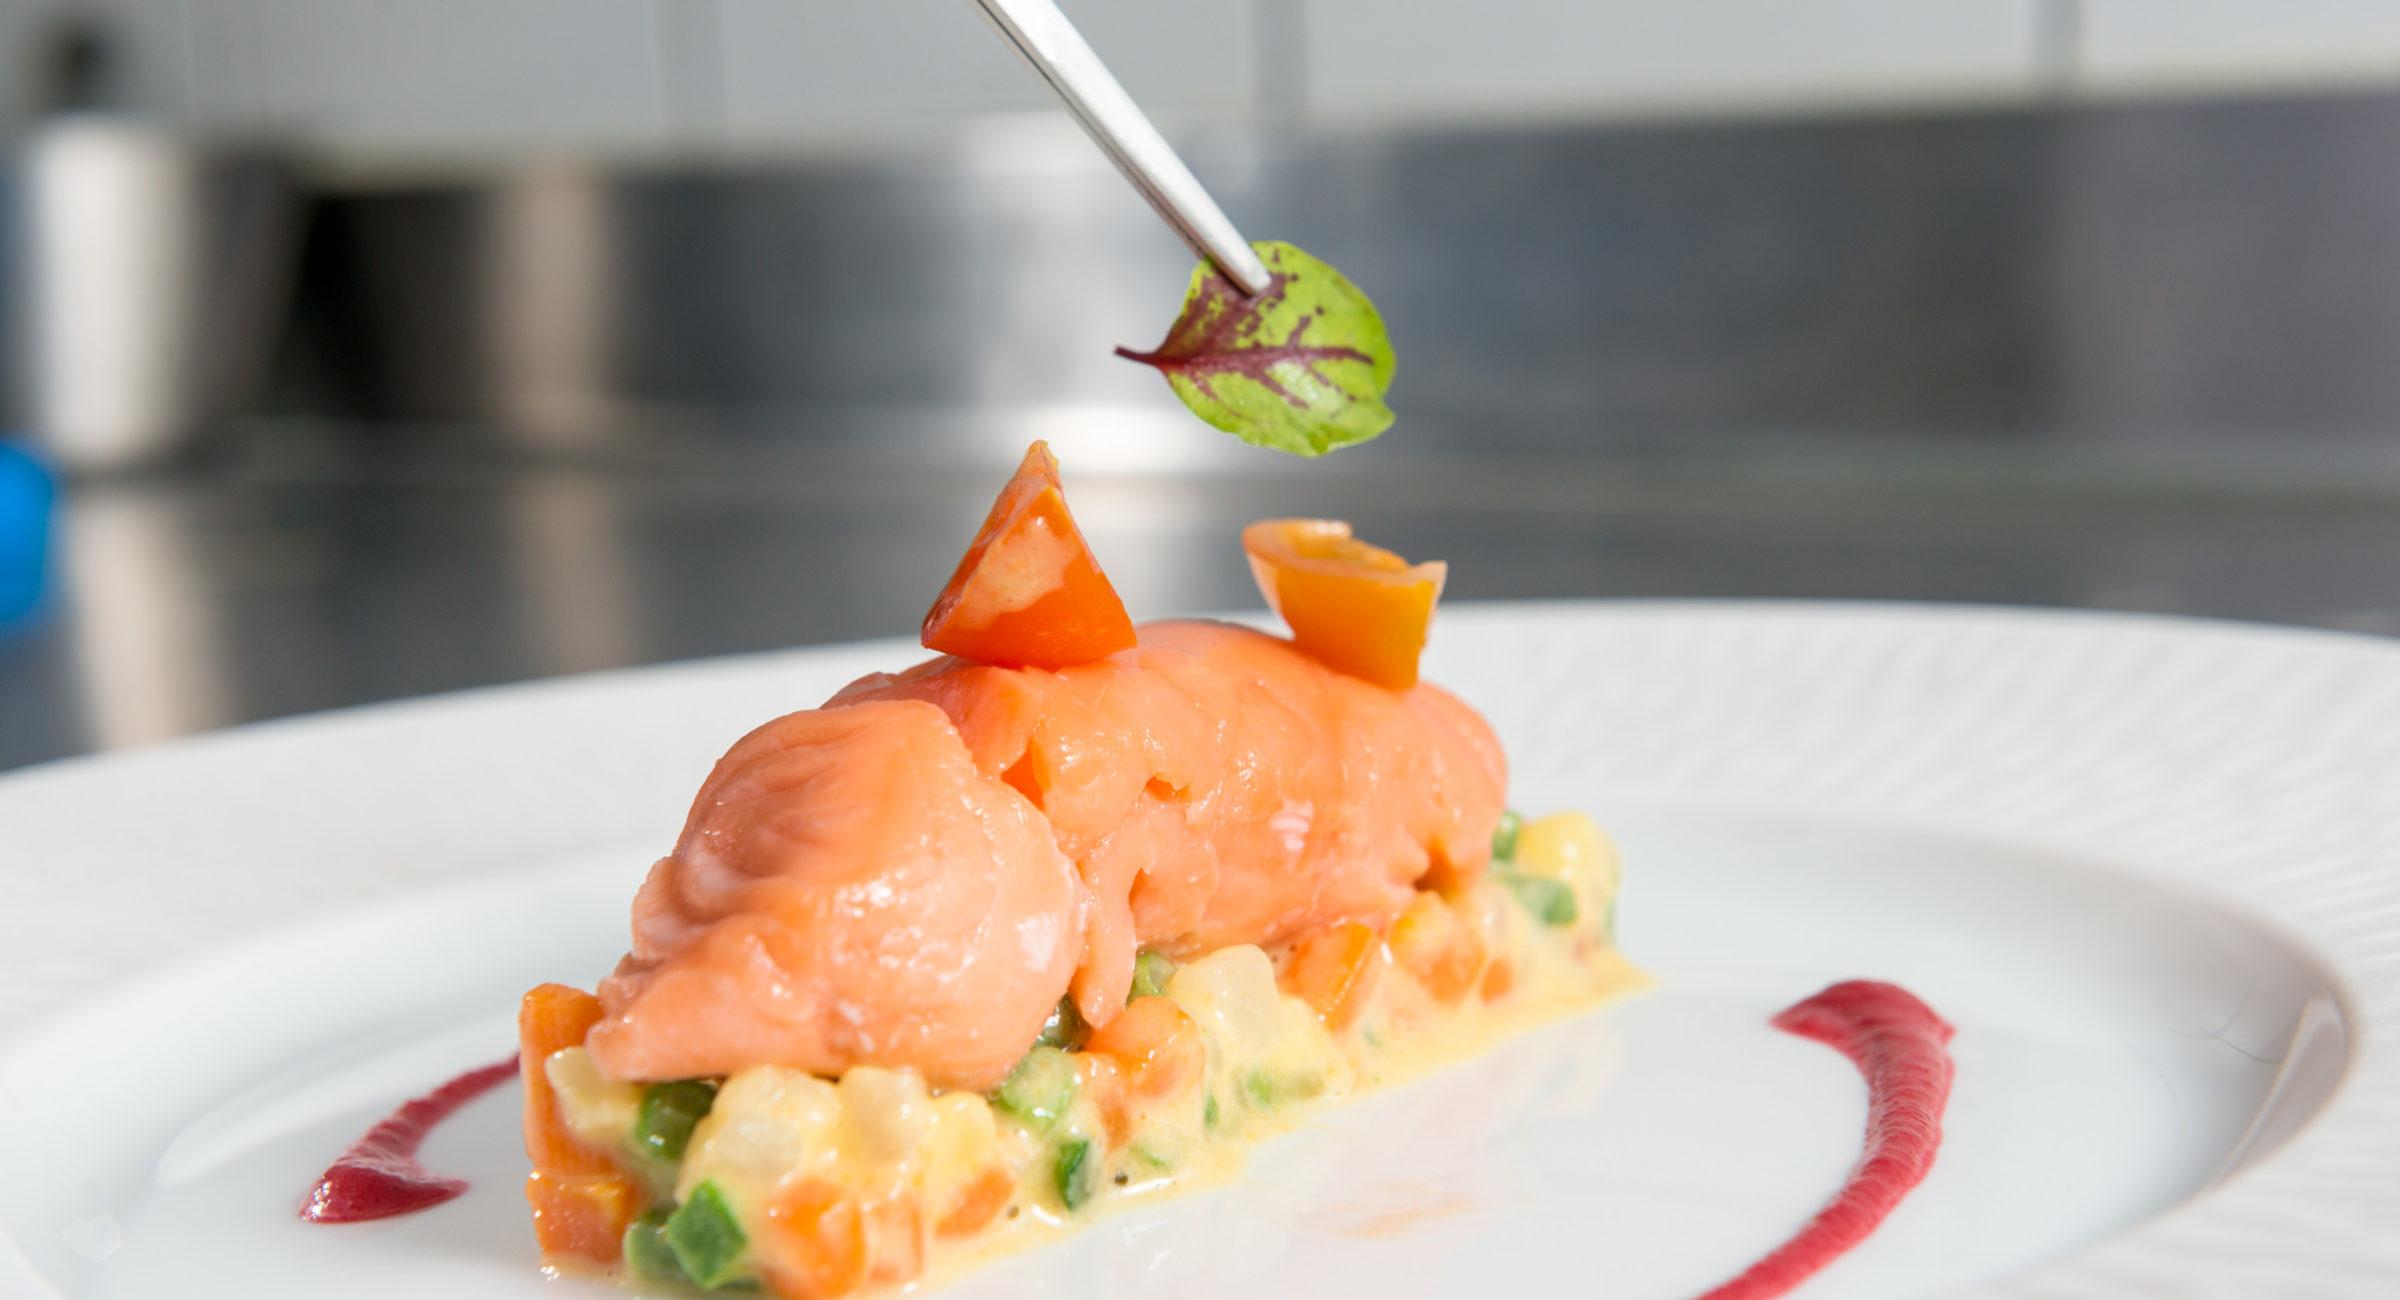 Chef cuisinier cgad les m tiers du go t for Chef cuisinier emploi